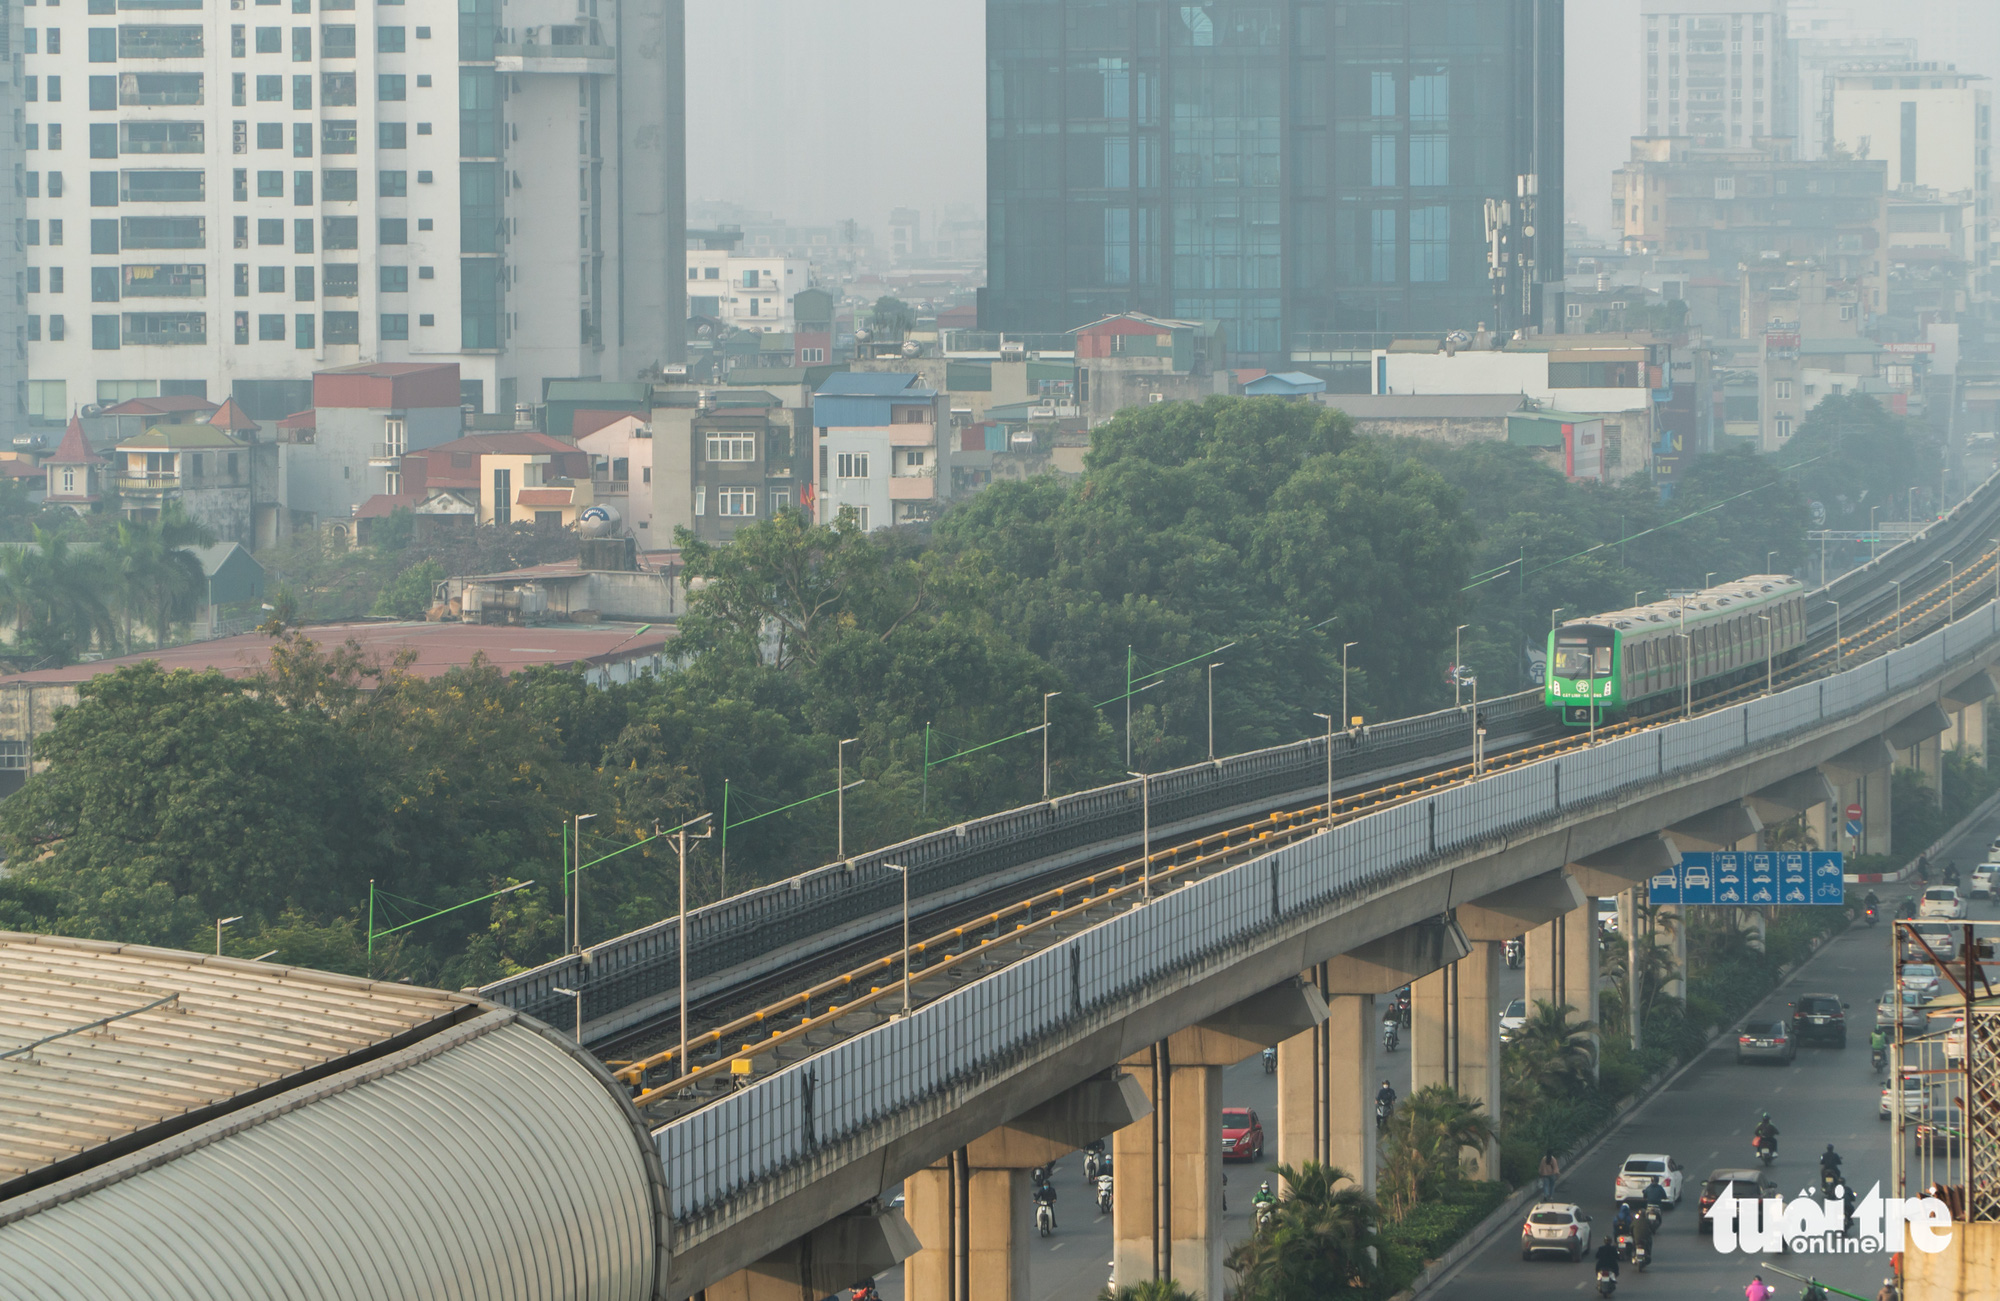 The test run of the Cat Linh-Ha Dong urban railway line begins in Hanoi, December 12, 2020. Photo: Pham Tuan / Tuoi Tre